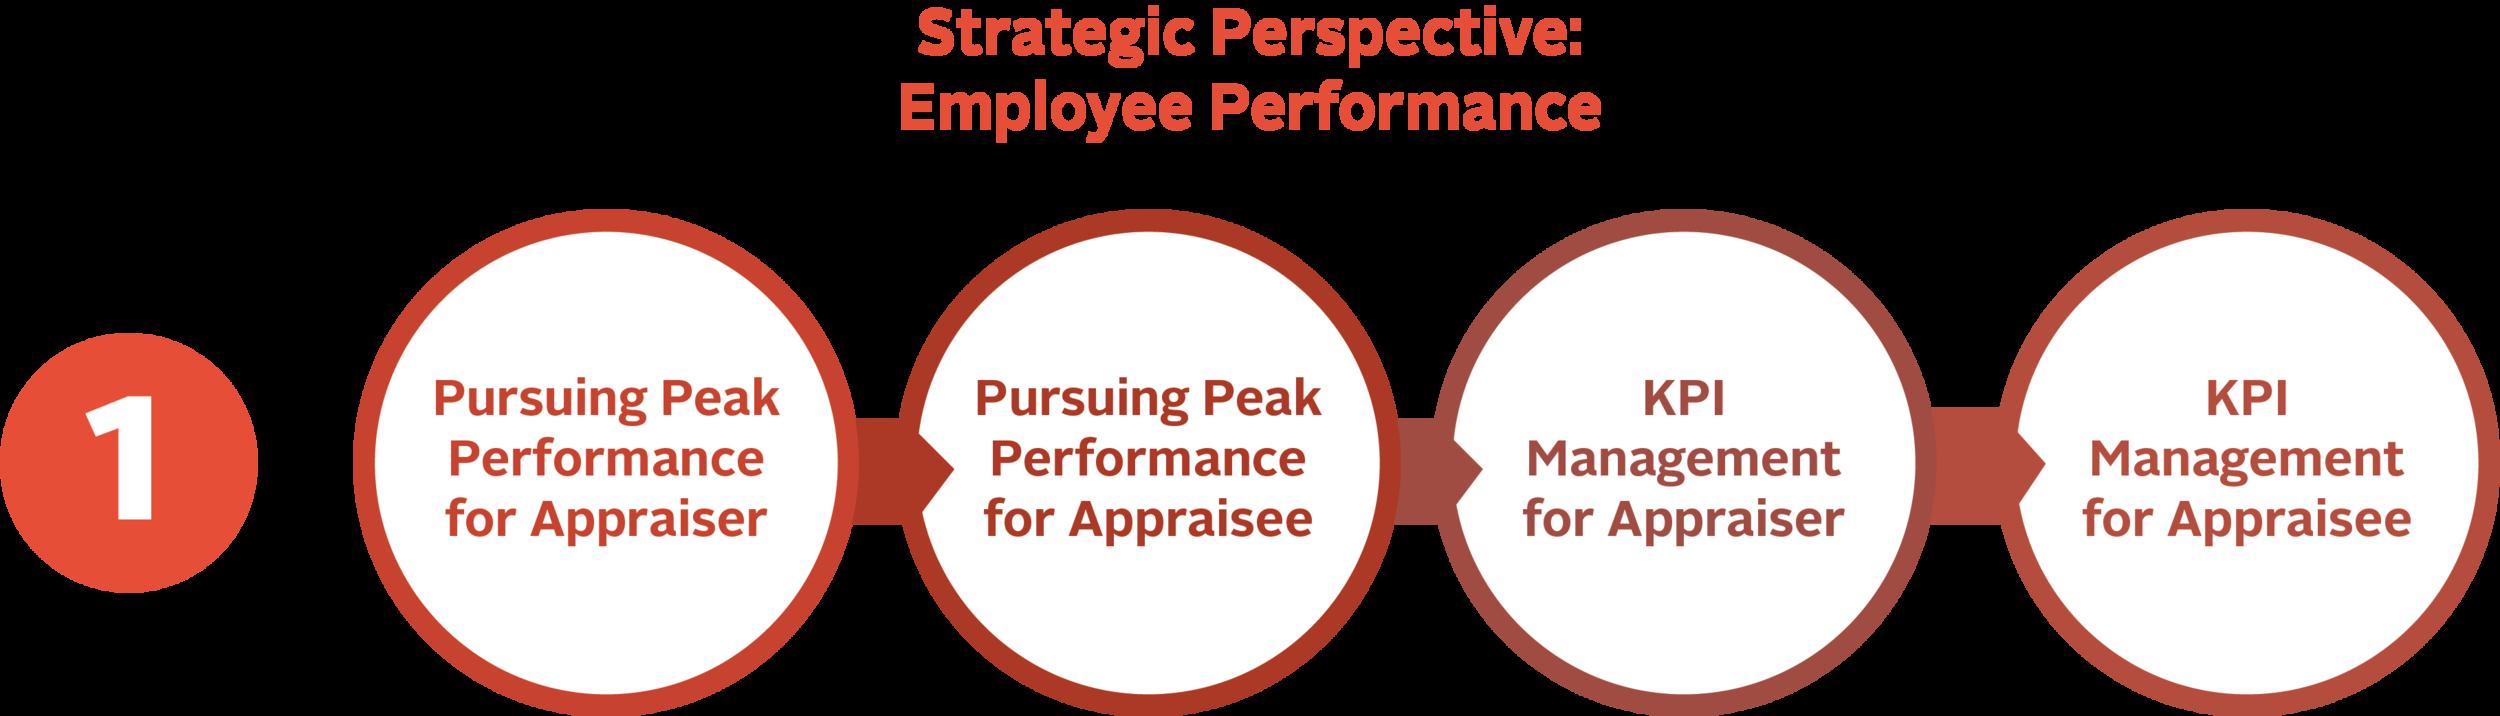 Strategic Perspective: Employee Performance